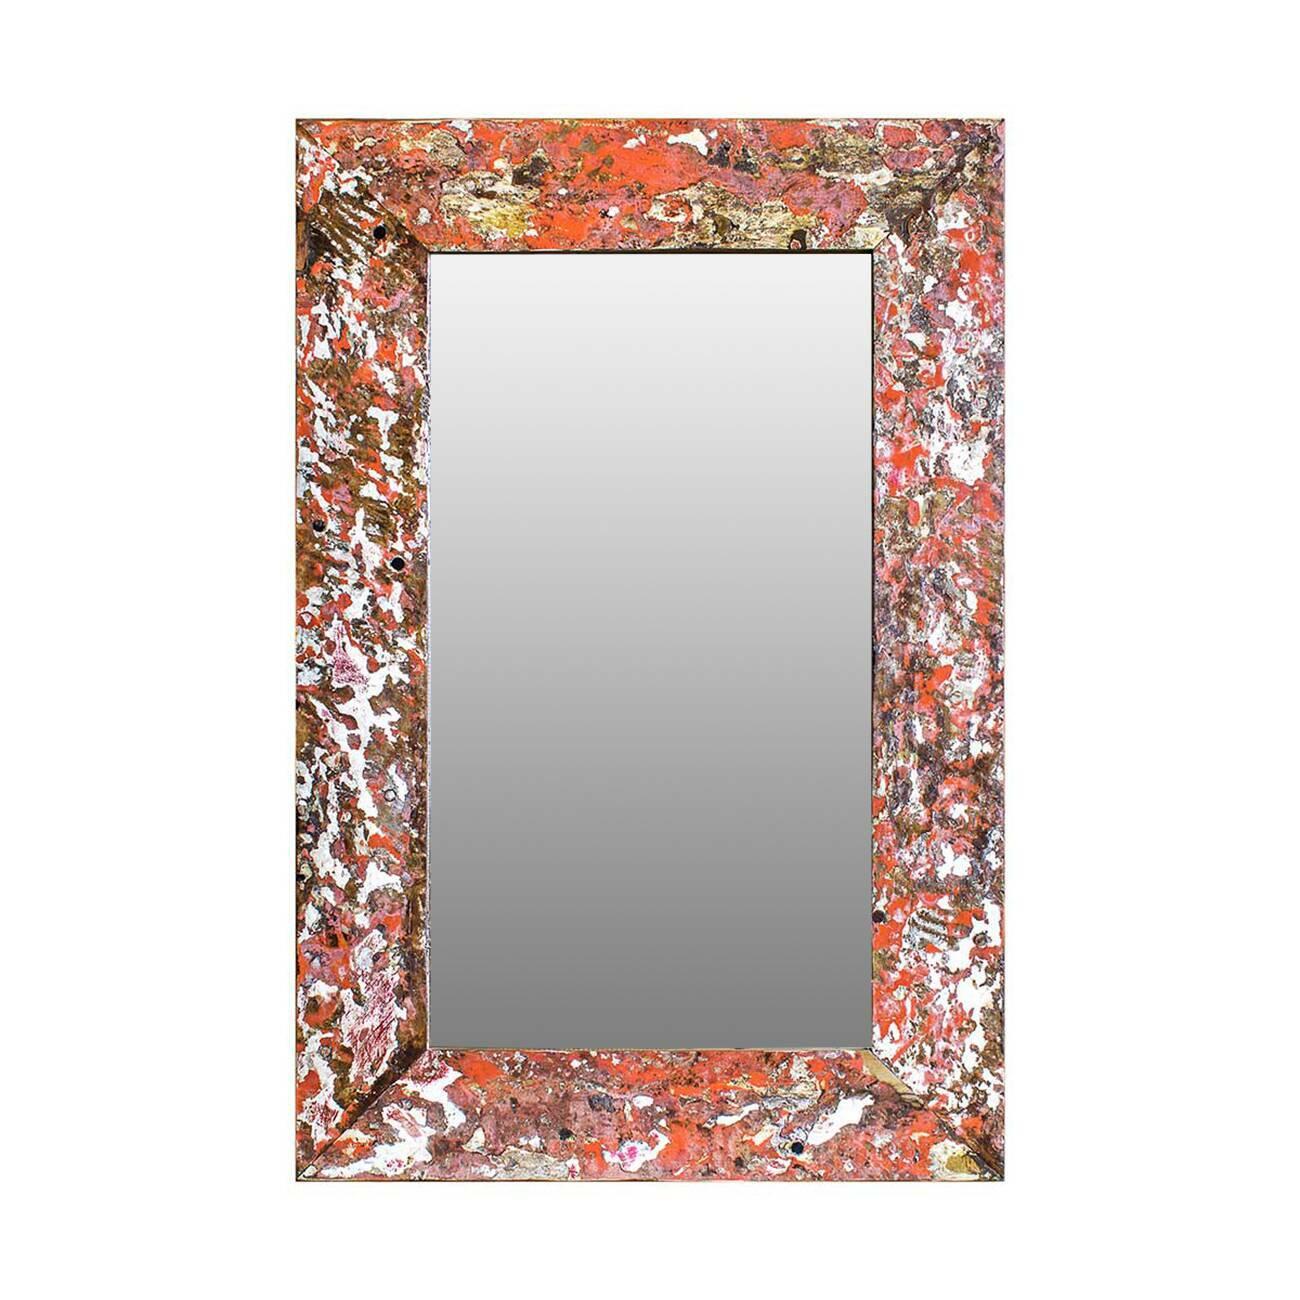 Зеркало Like Lodka 15576094 от Cosmorelax